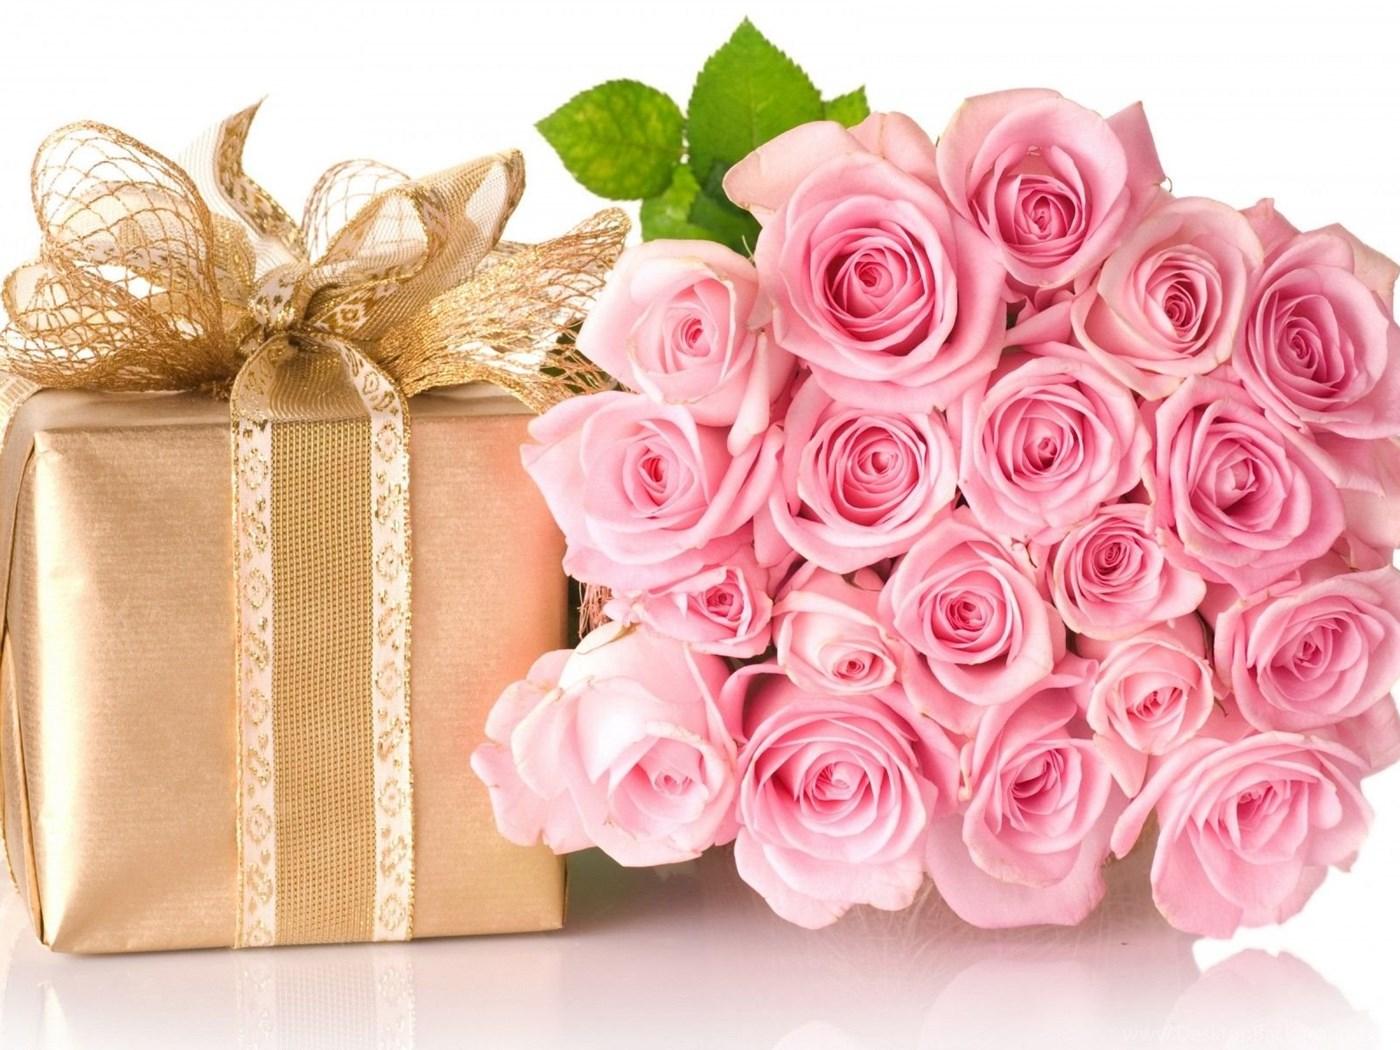 Happy Birthday Flowers Rose Imagesg Desktop Background